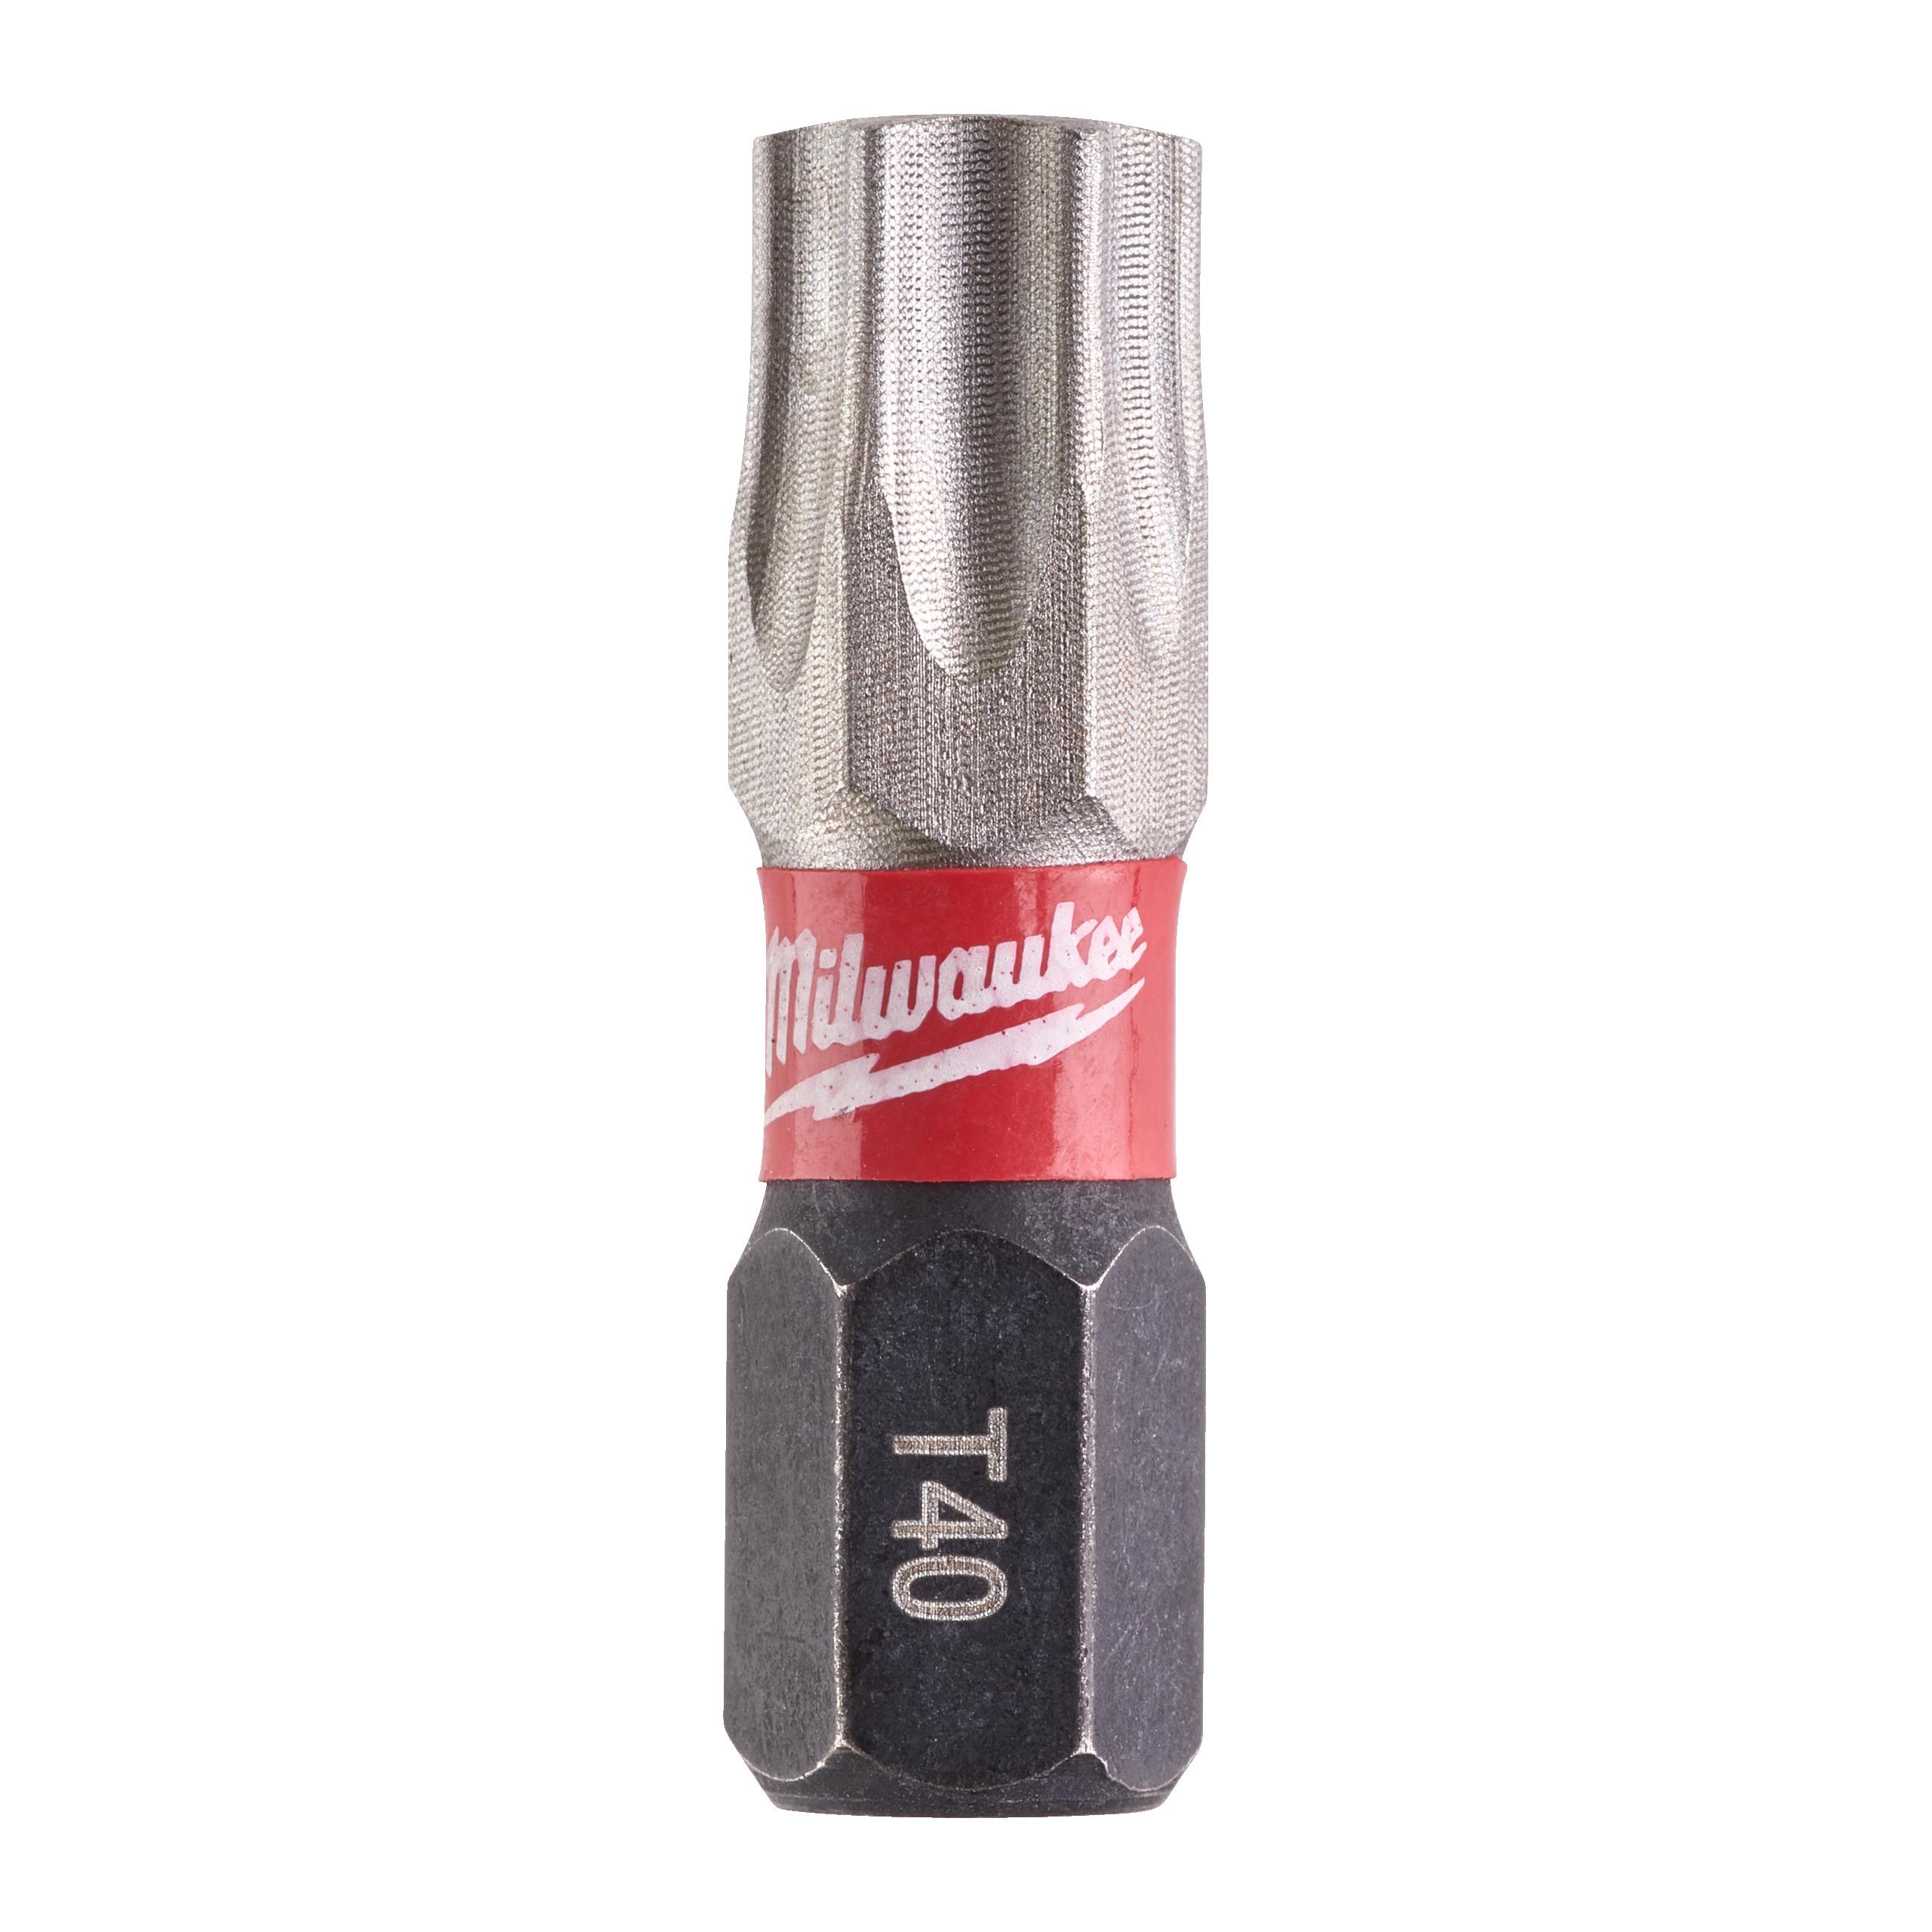 Šroubovací bity ShW TX BO40 25mm-2ks